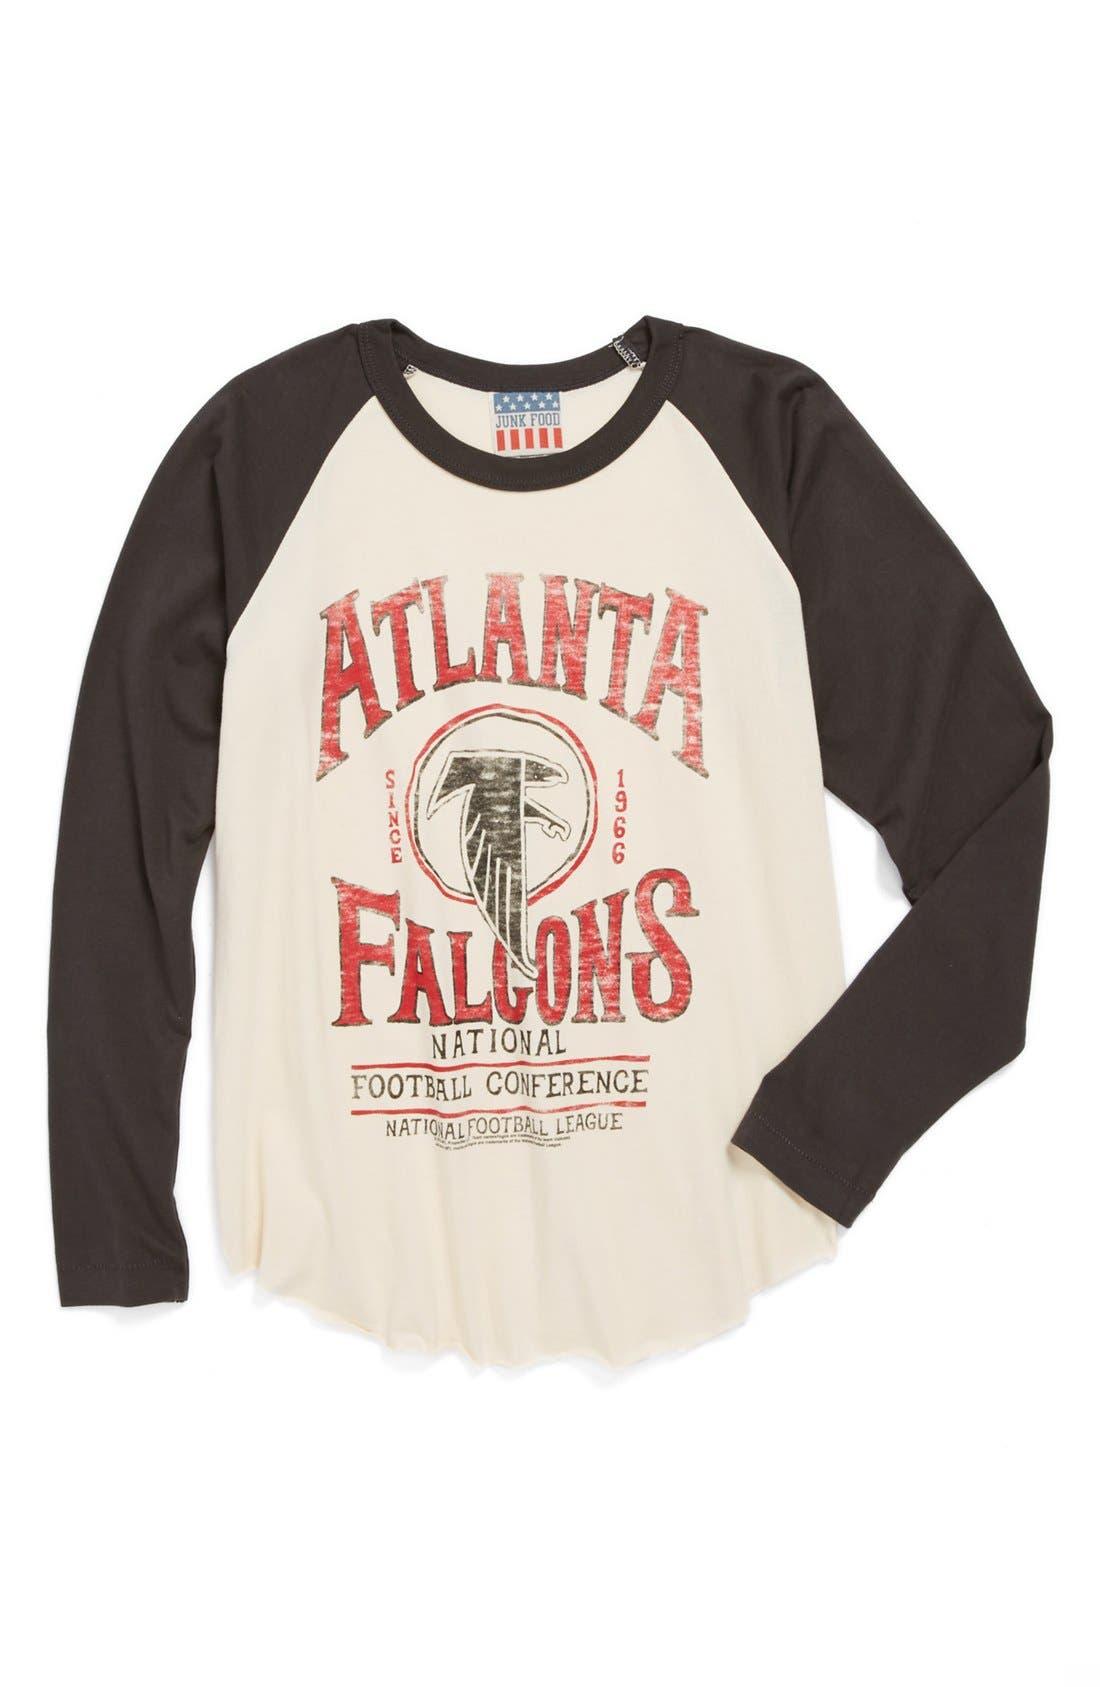 Alternate Image 1 Selected - Junk Food 'Atlanta Falcons' Raglan Long Sleeve T-Shirt (Toddler Boys)